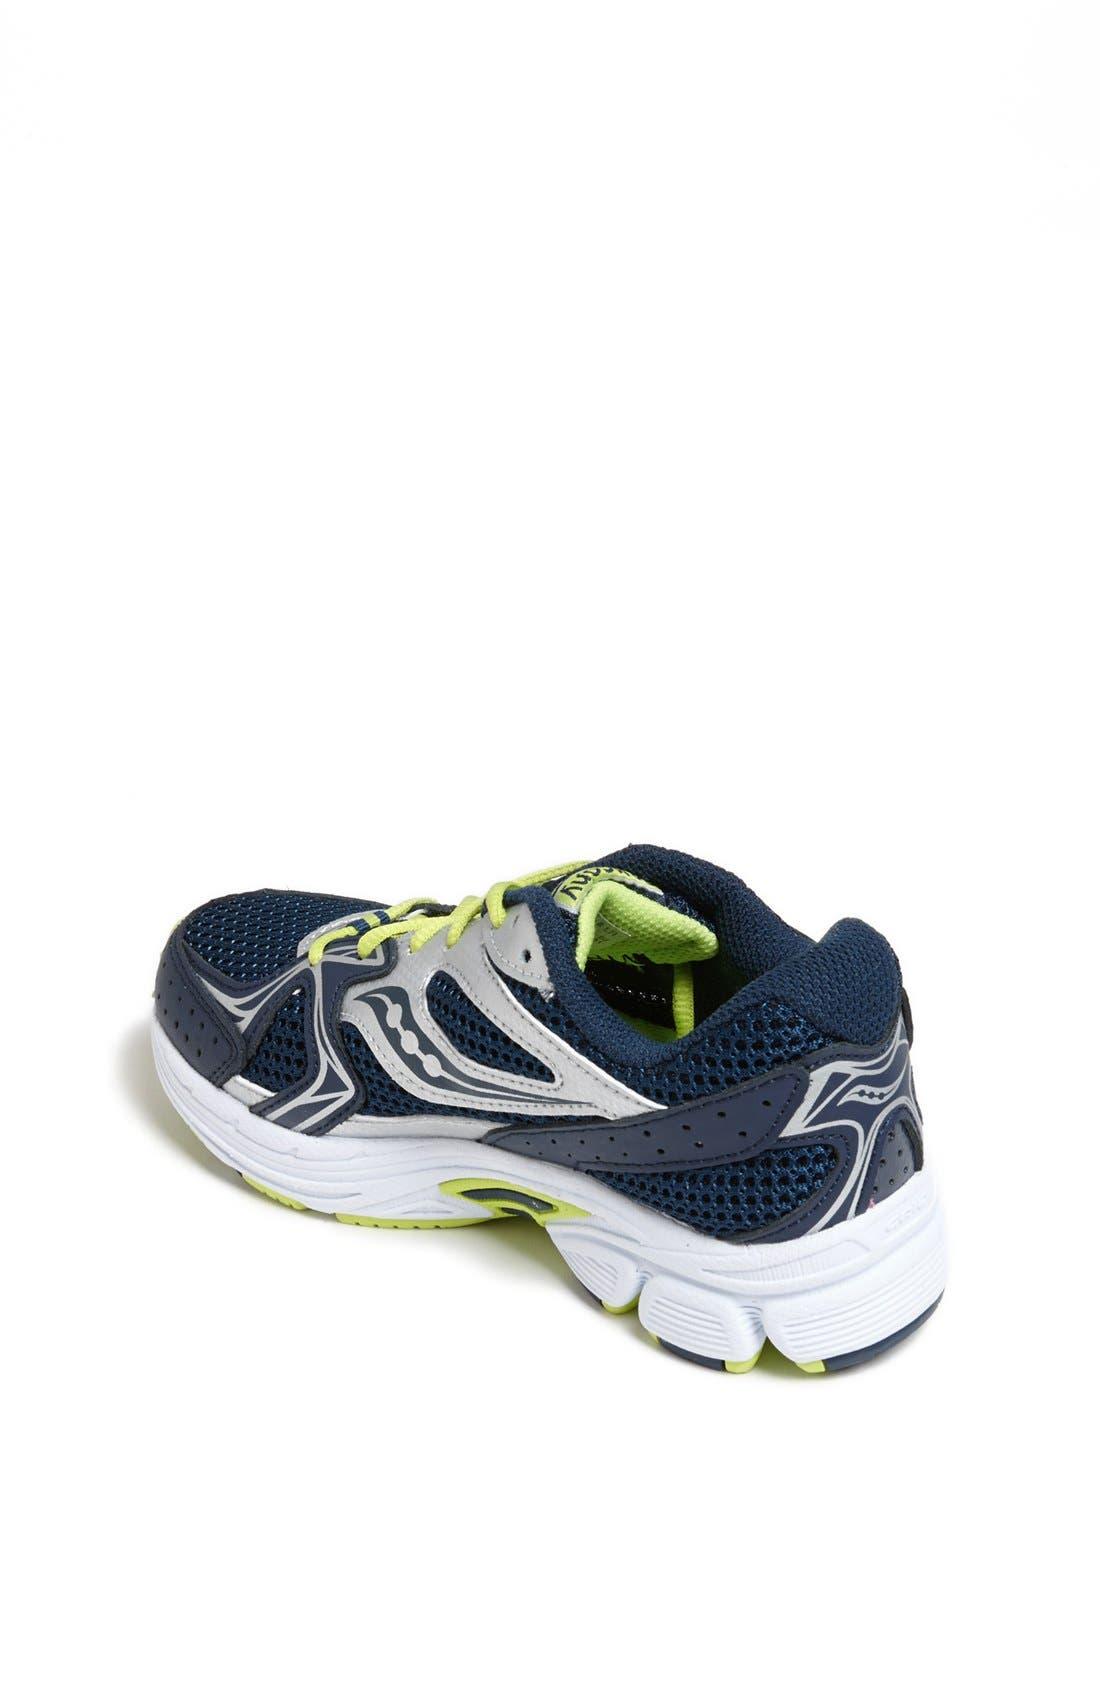 Alternate Image 2  - Saucony 'Cohesion' Running Shoe (Toddler, Little Kid & Big Kid)